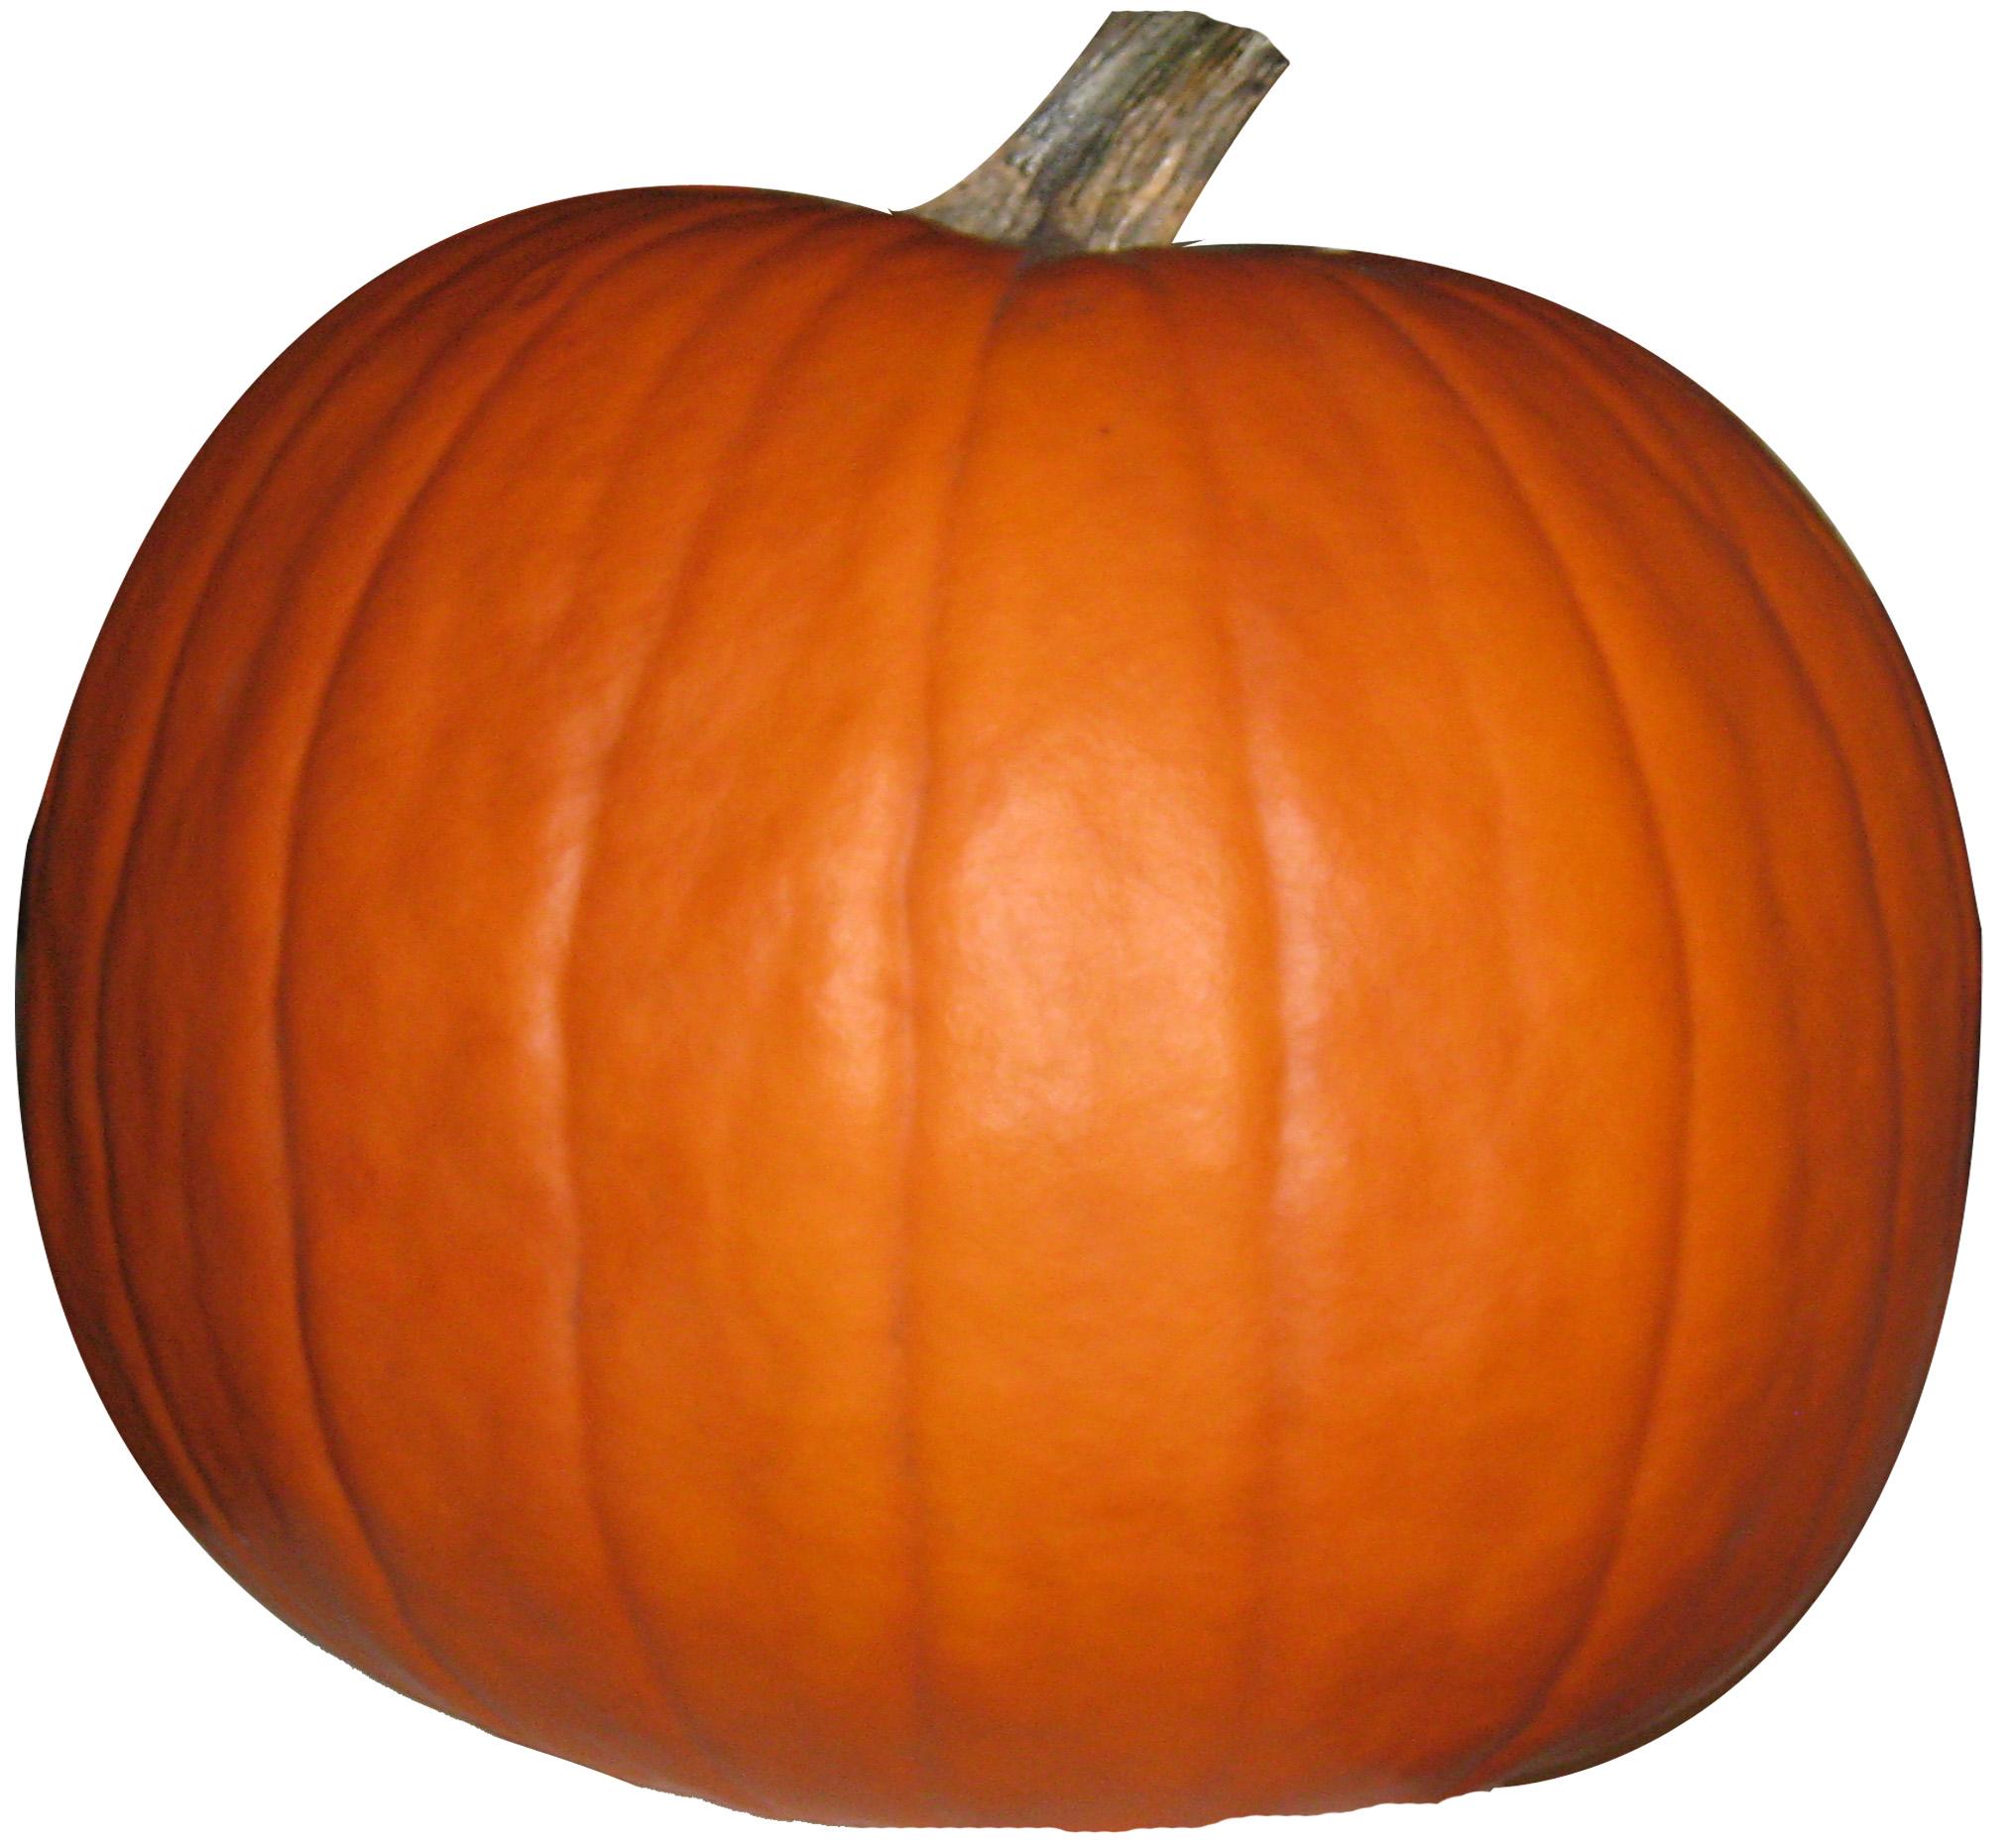 Make Your Own Pumpkin RPC | ArchVision Blog